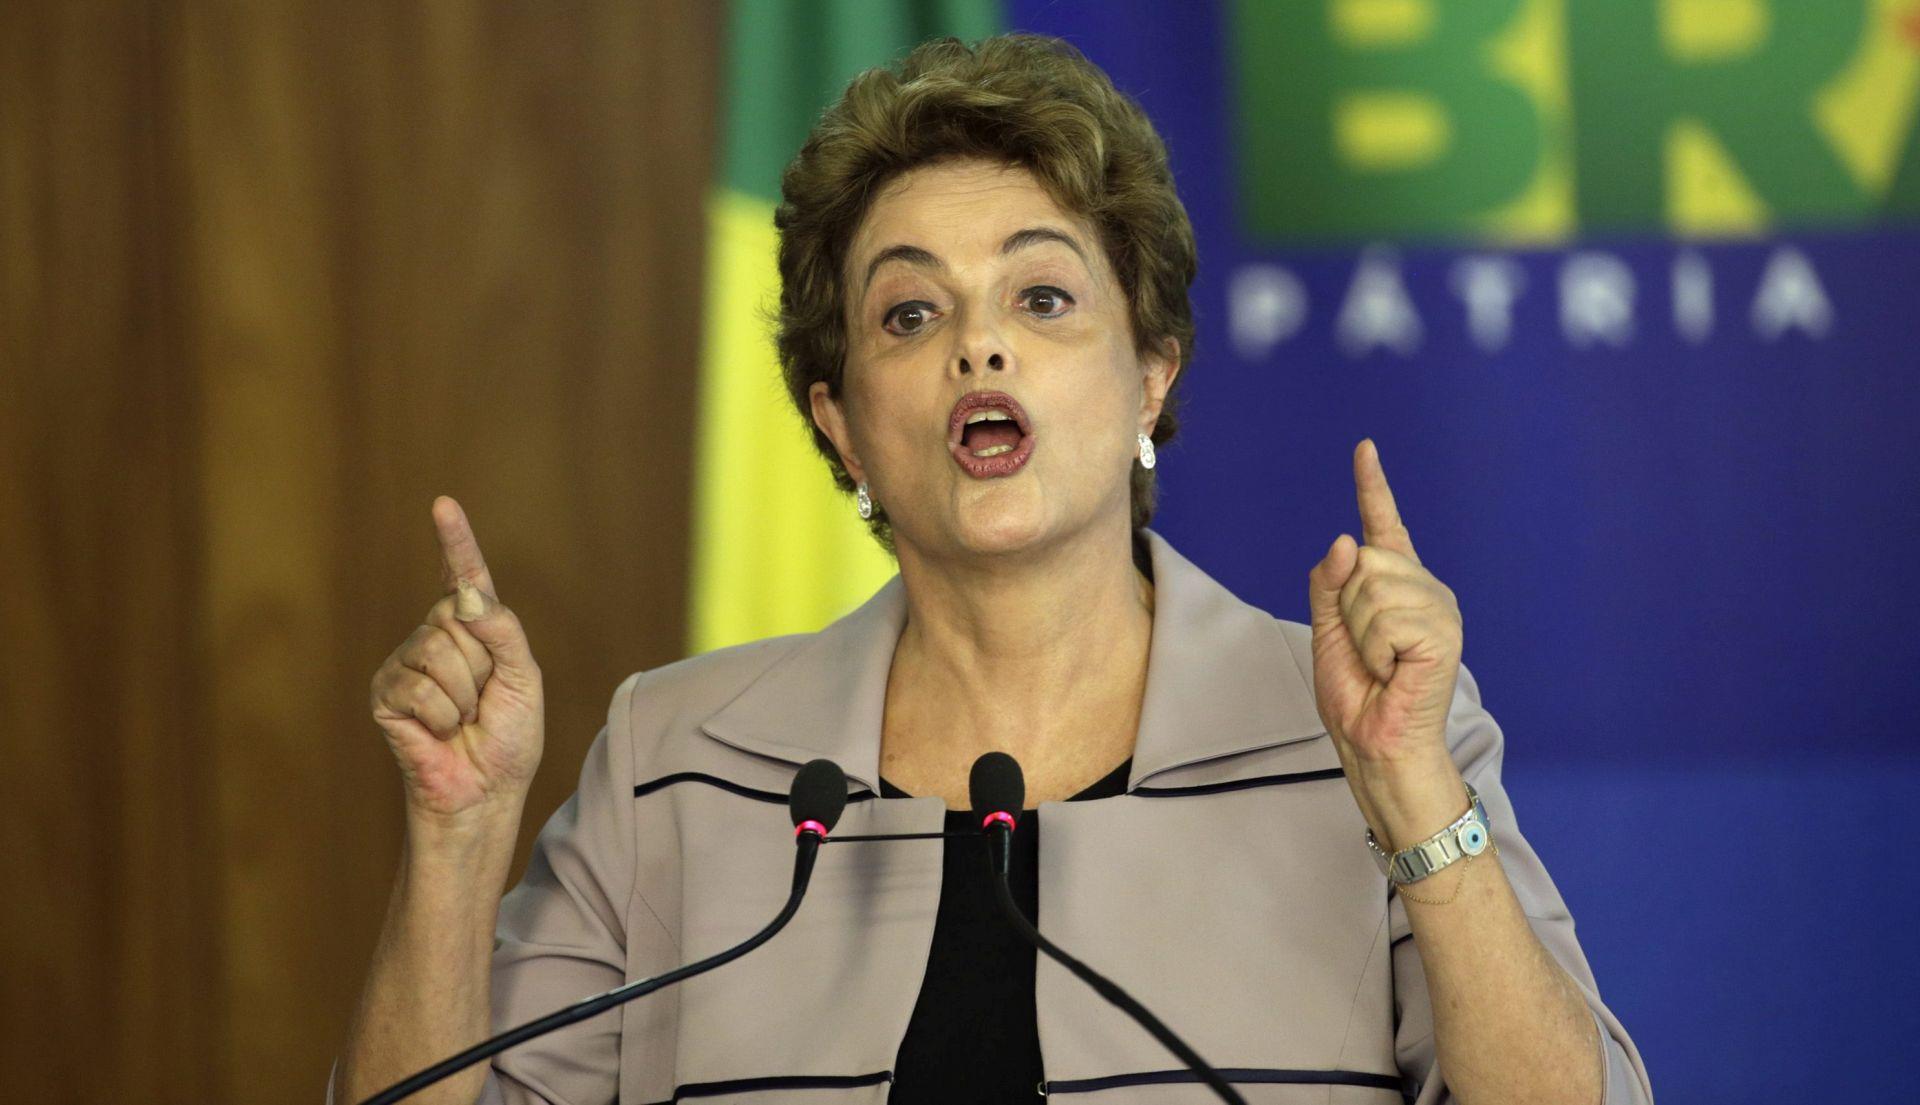 BRAZILSKI KONGRES: Rasprava o opozivu predsjednice Dilme Rousseff